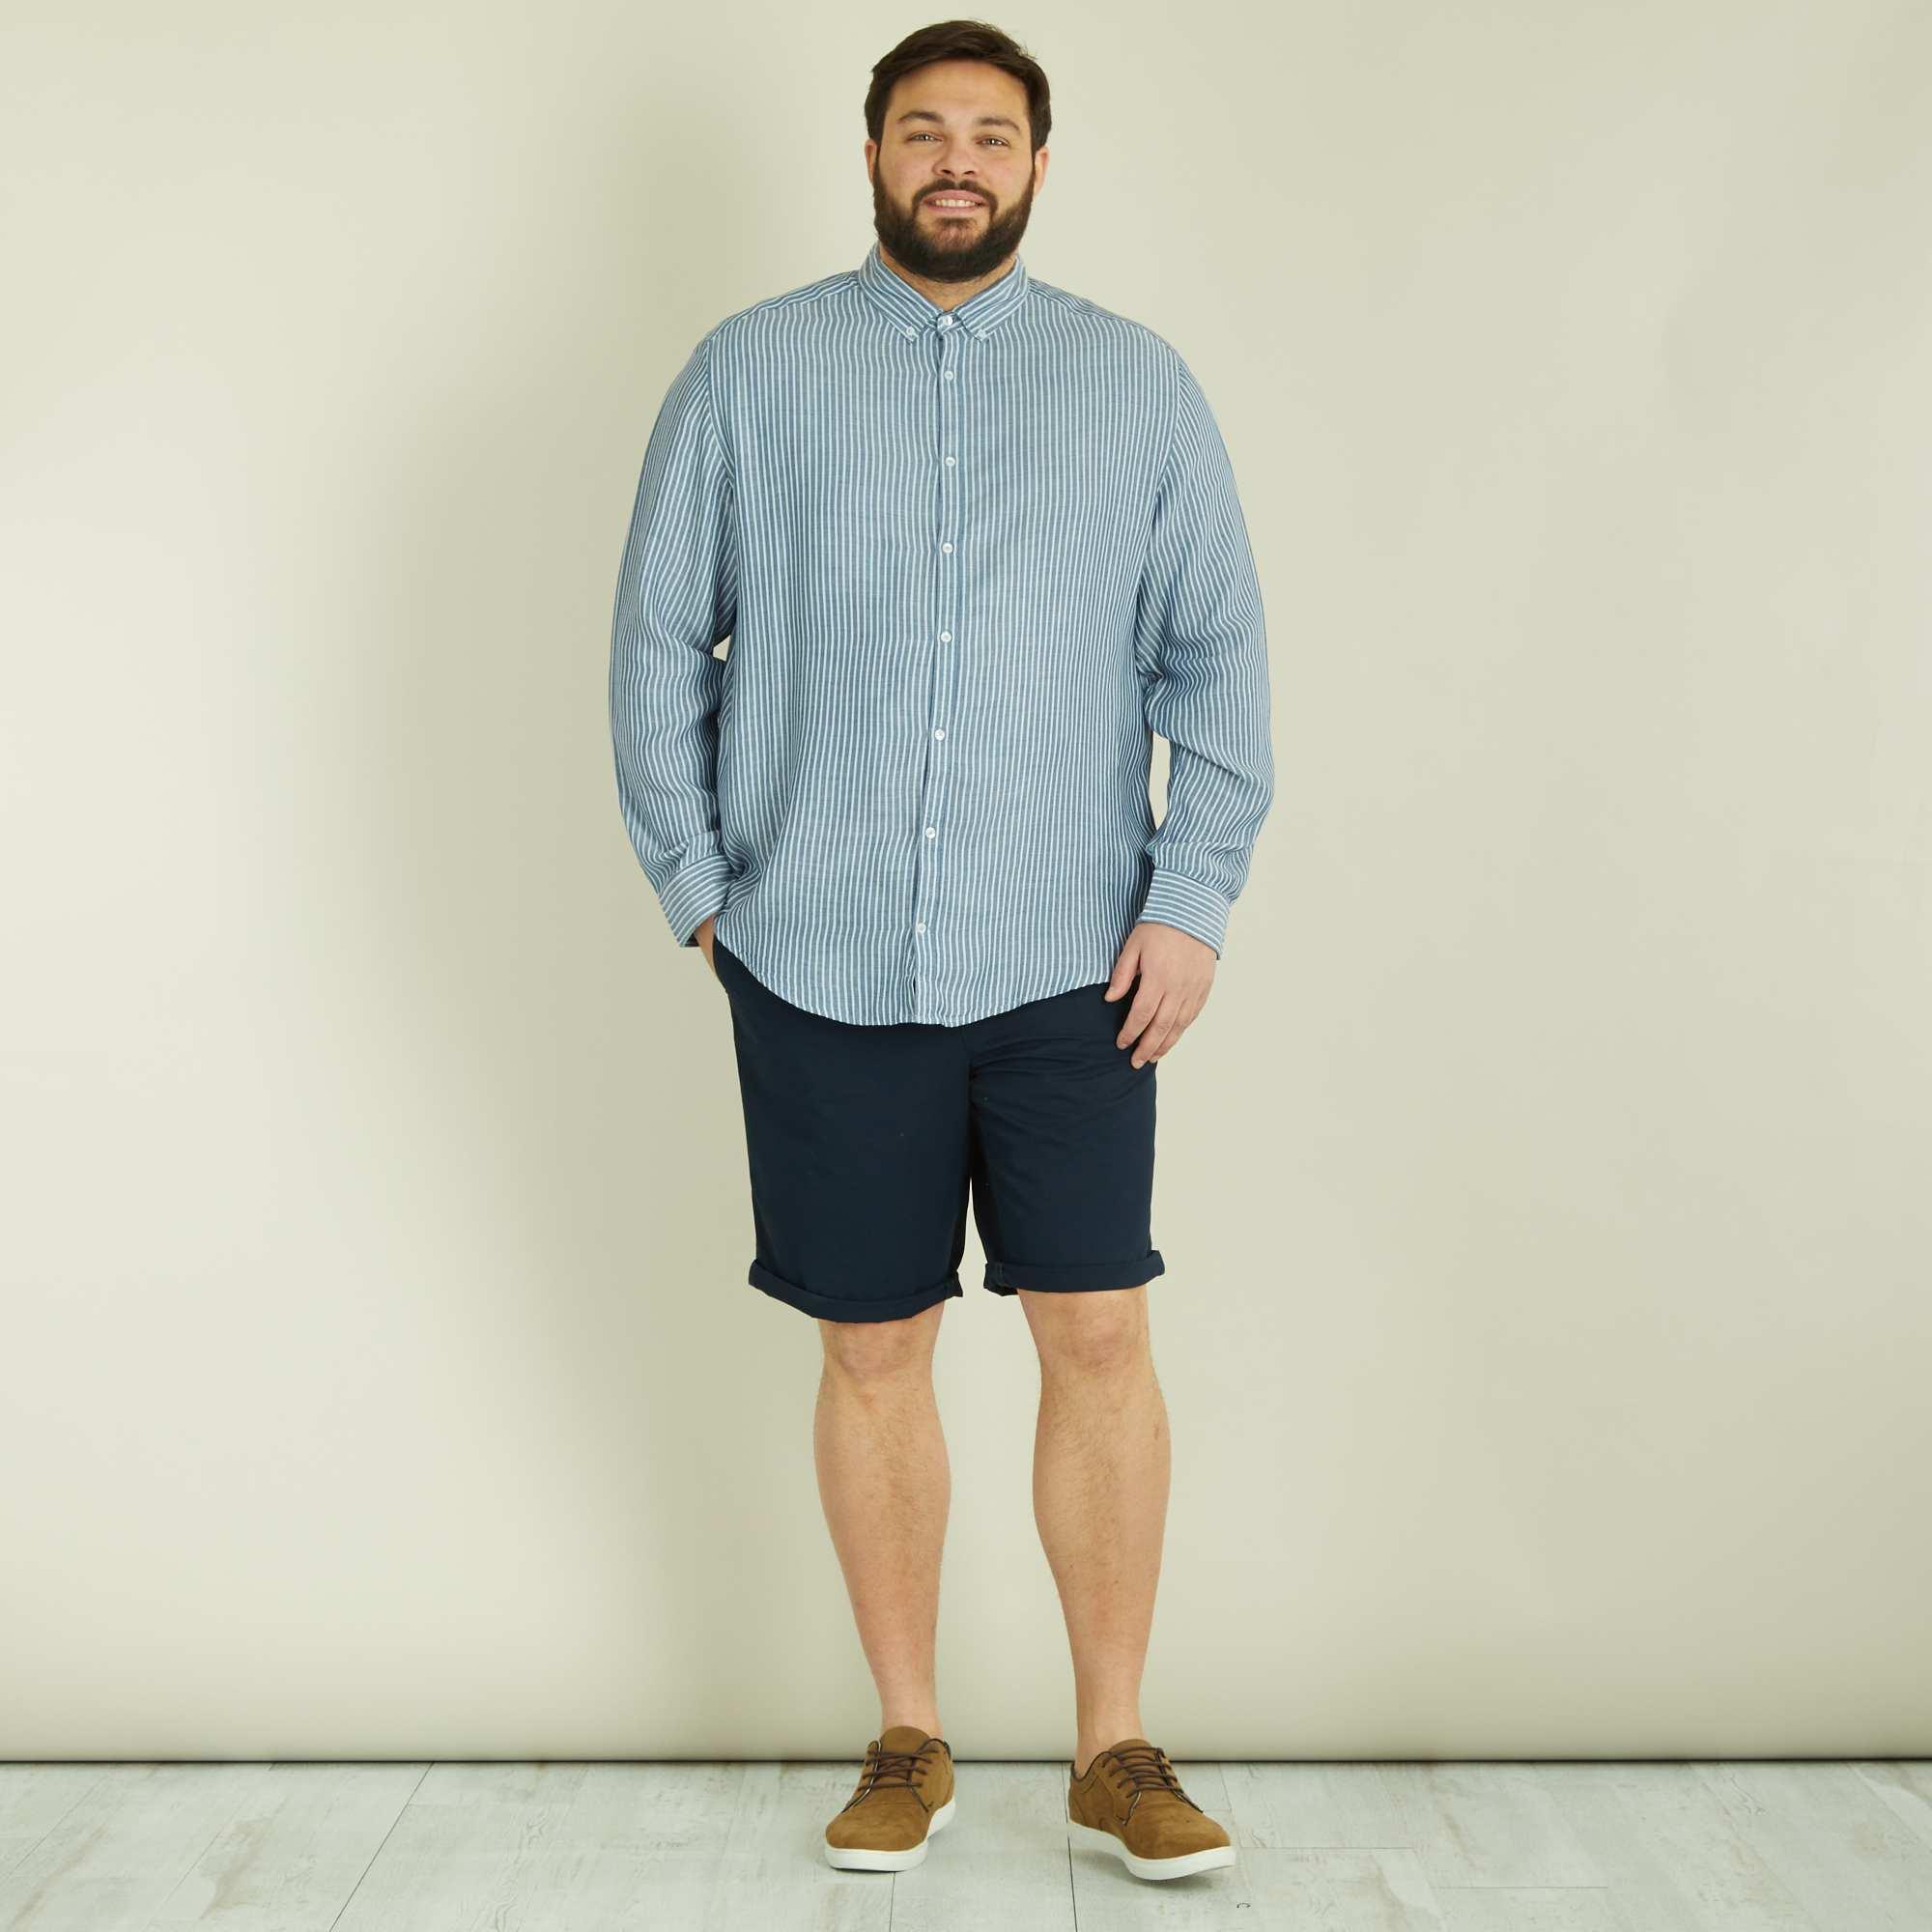 bermuda chino uni twill l ger grande taille homme bleu marine kiabi 7 50. Black Bedroom Furniture Sets. Home Design Ideas